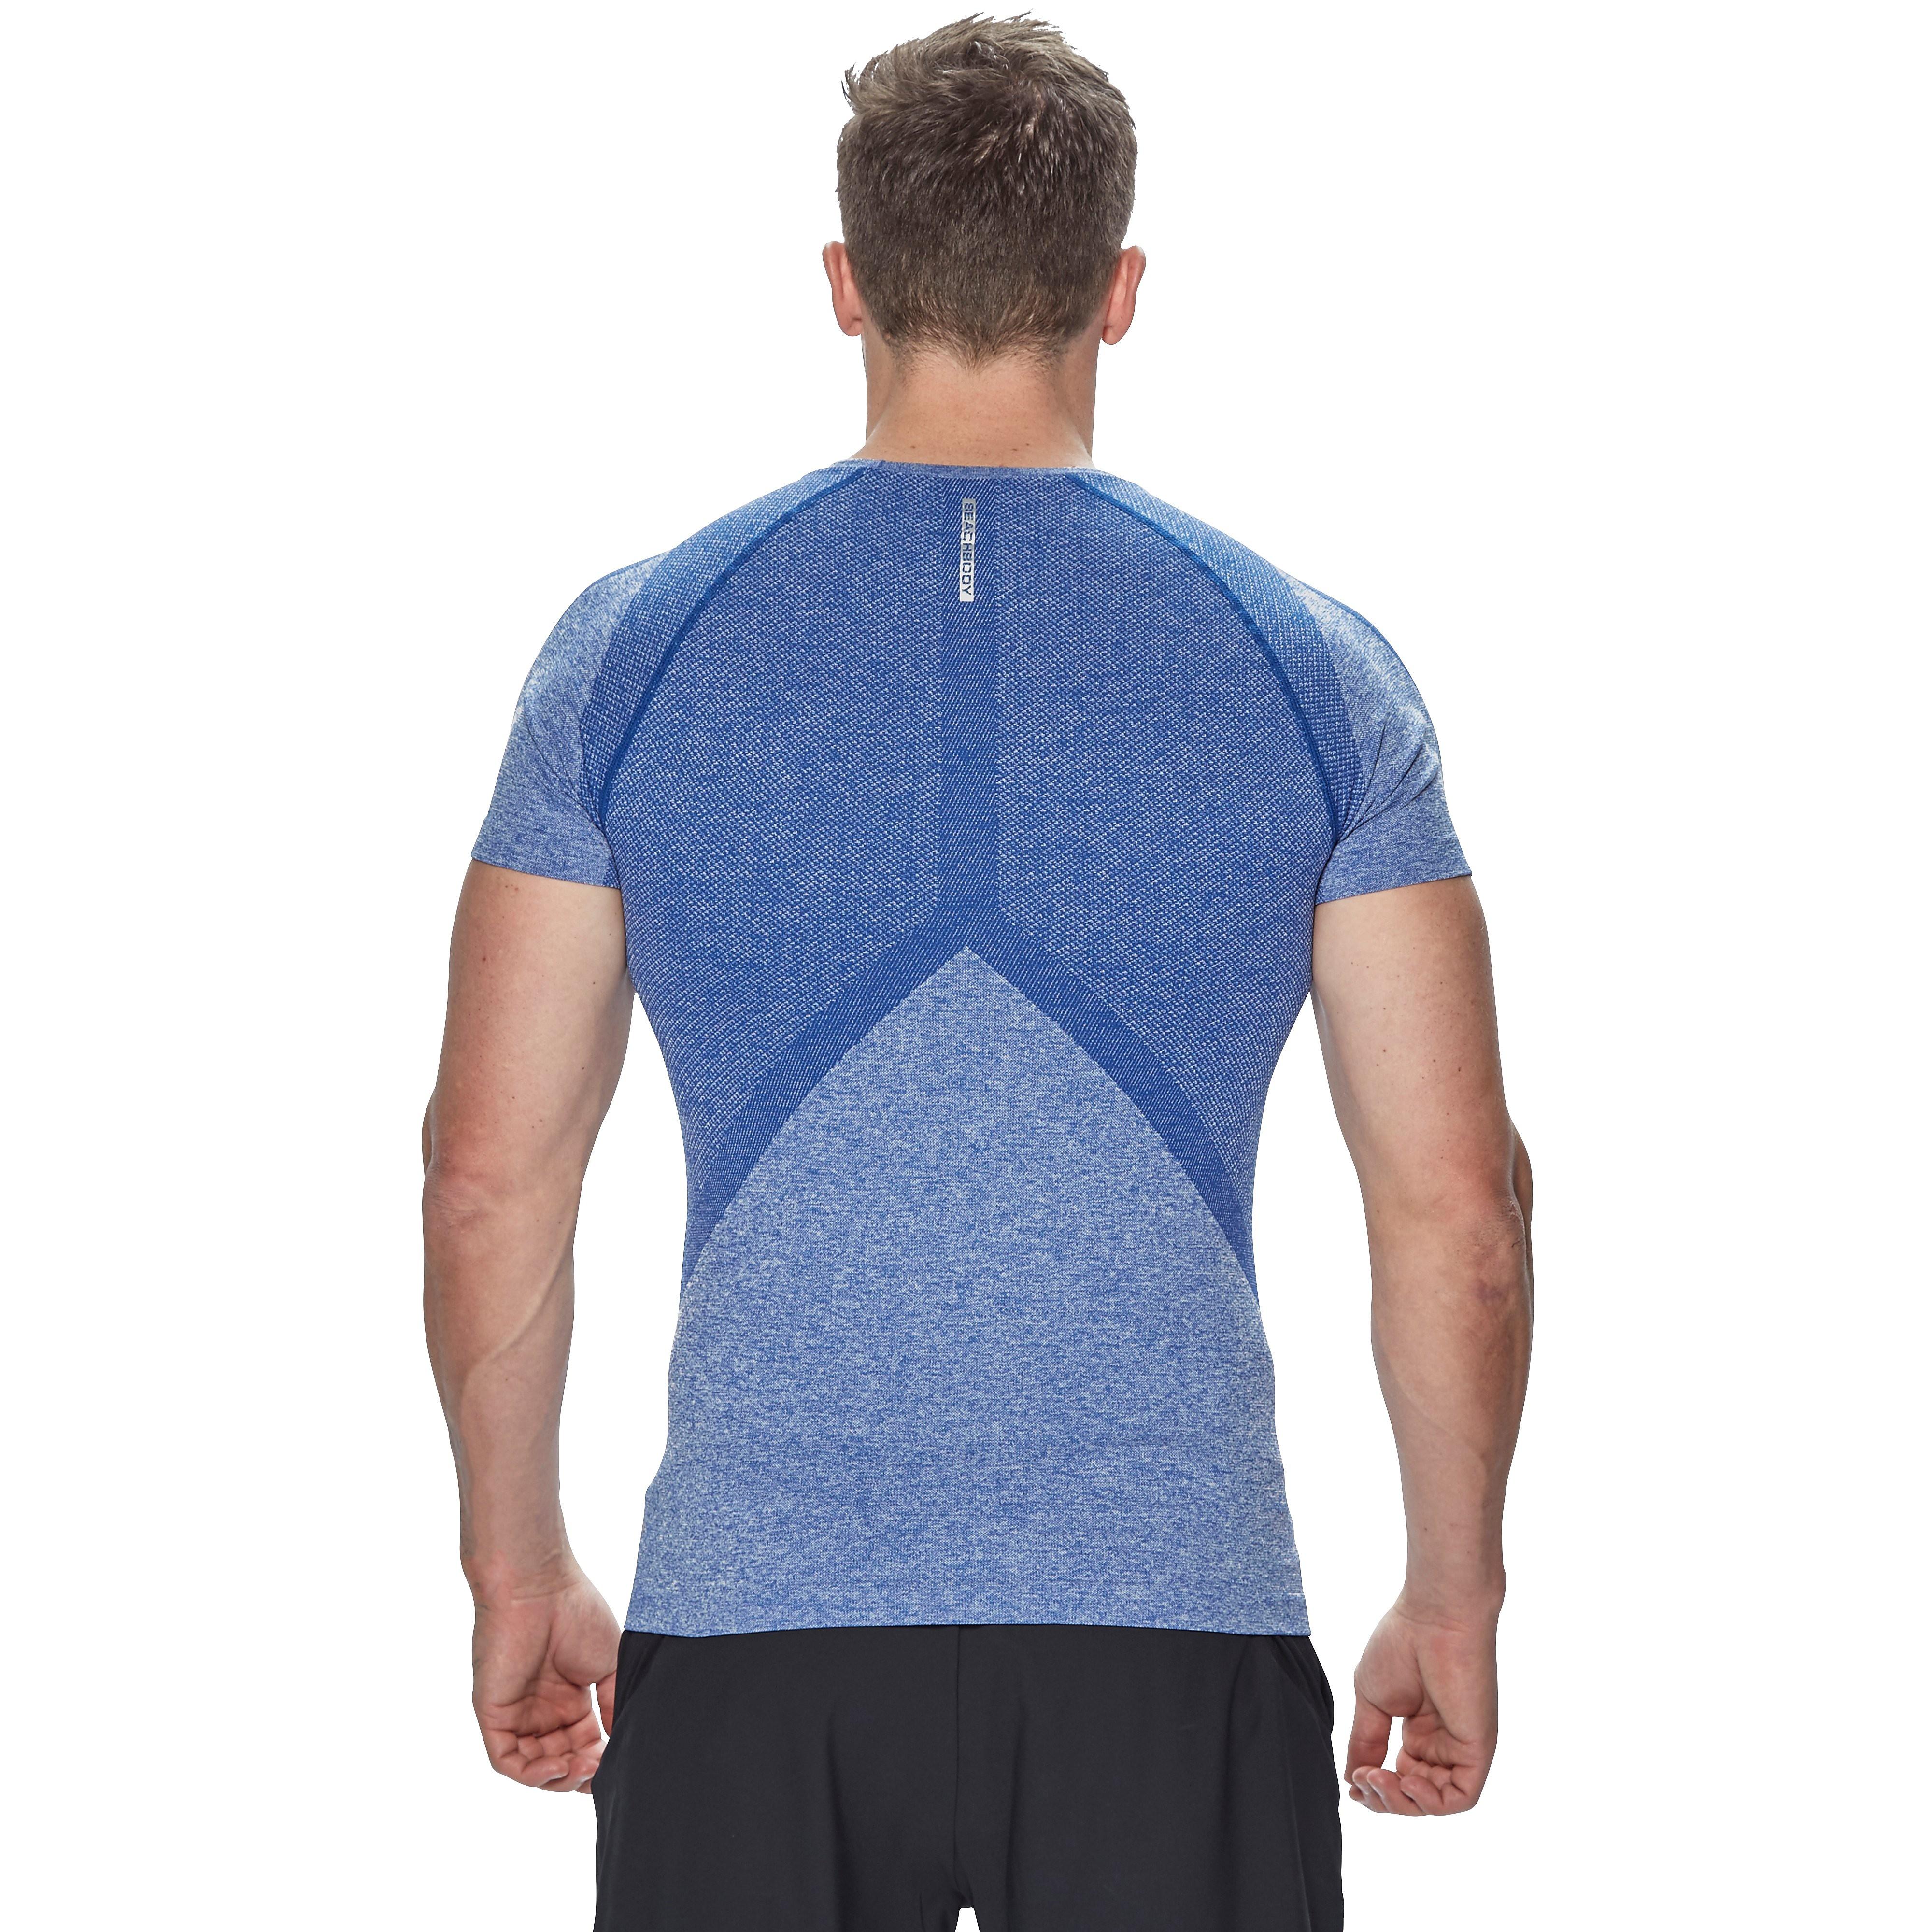 Beachbody Intent Compression Men's T-Shirt